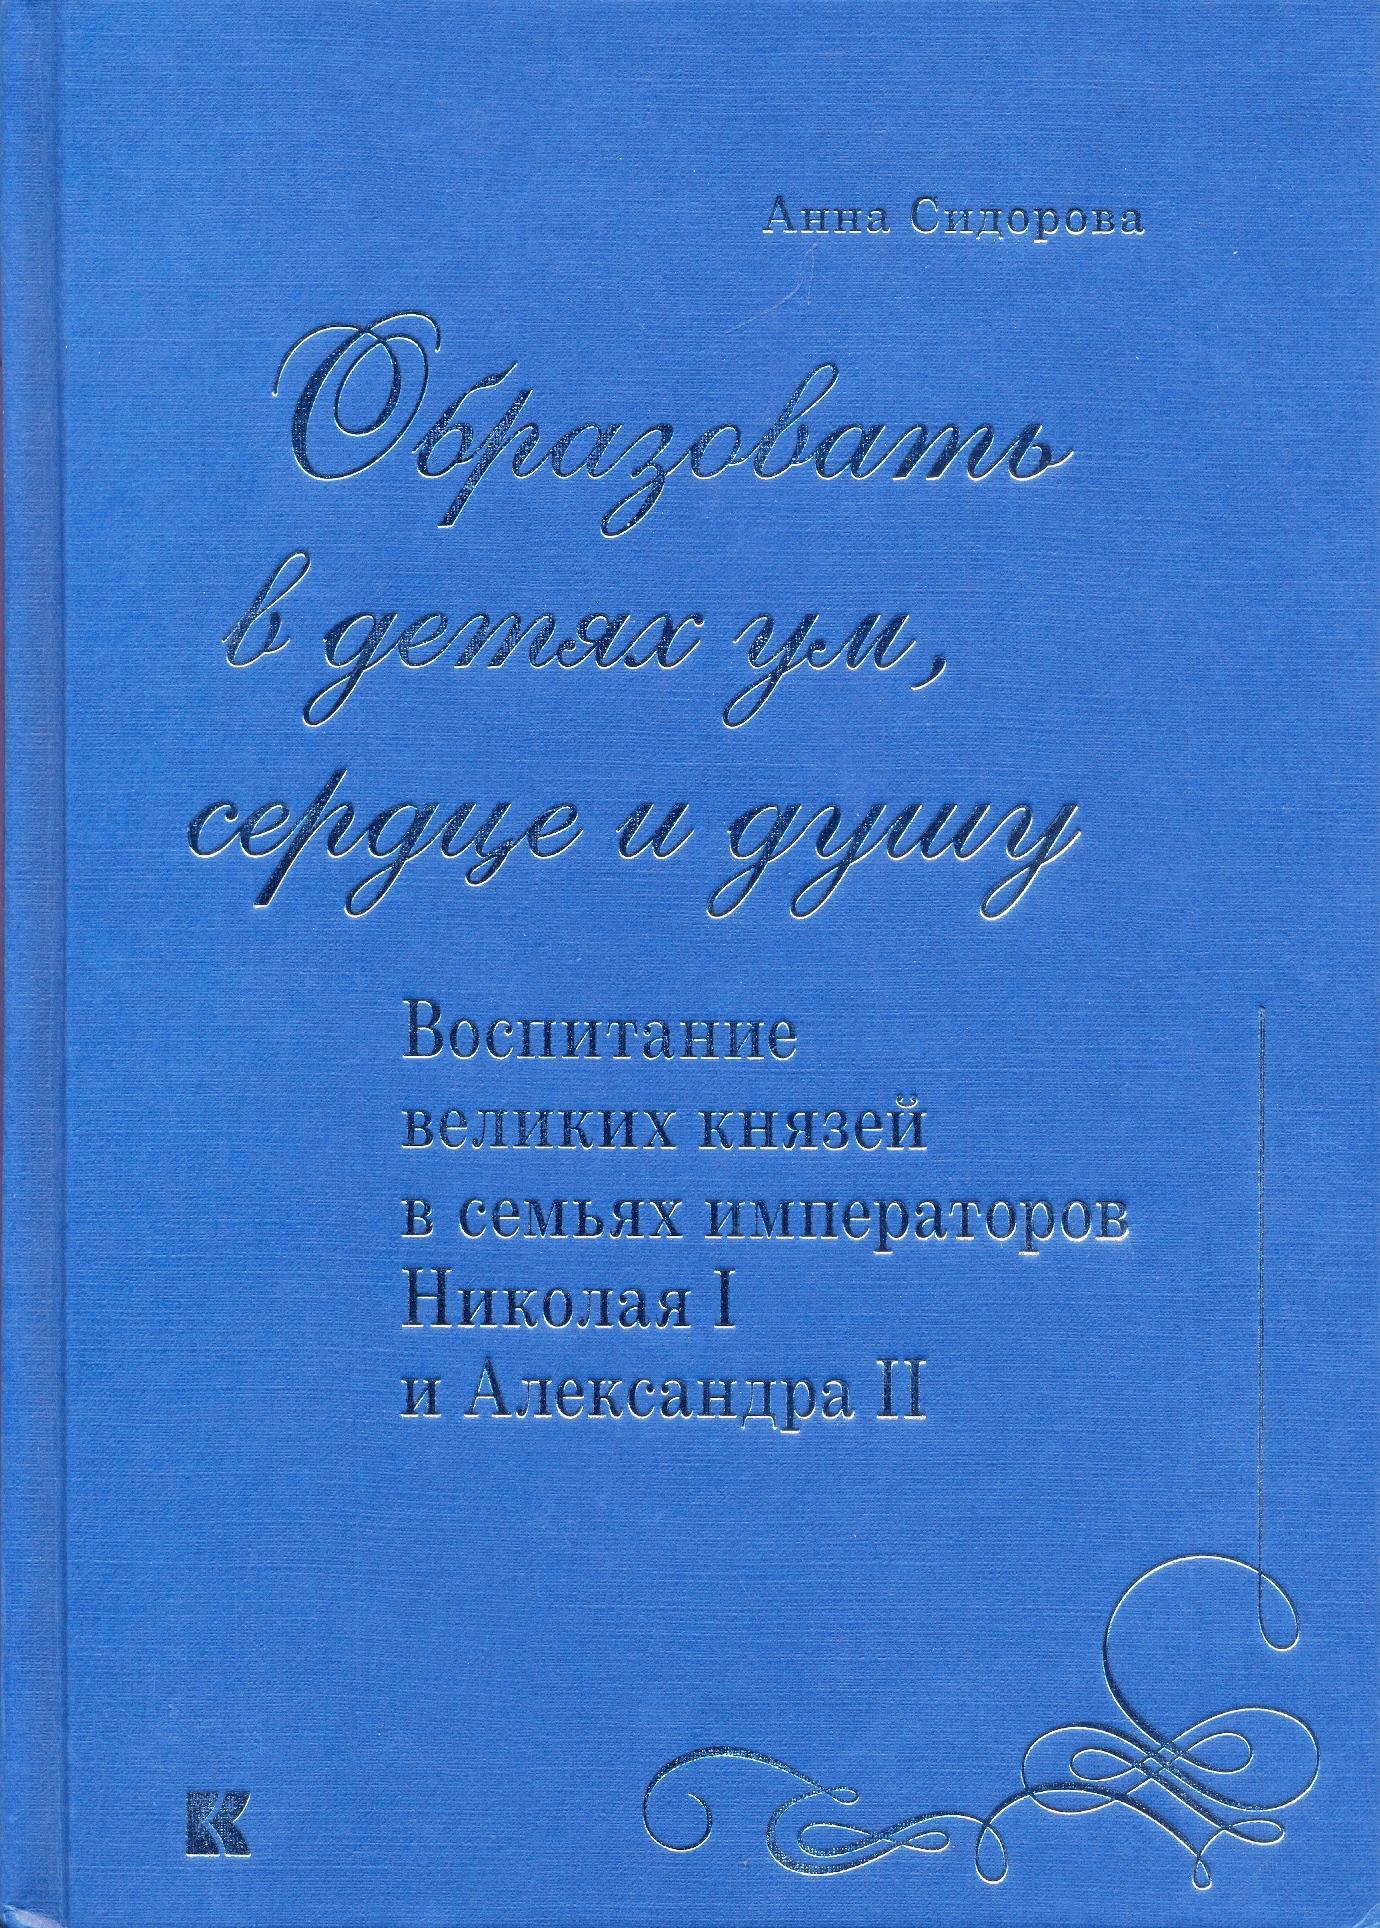 Изображение обложки книги